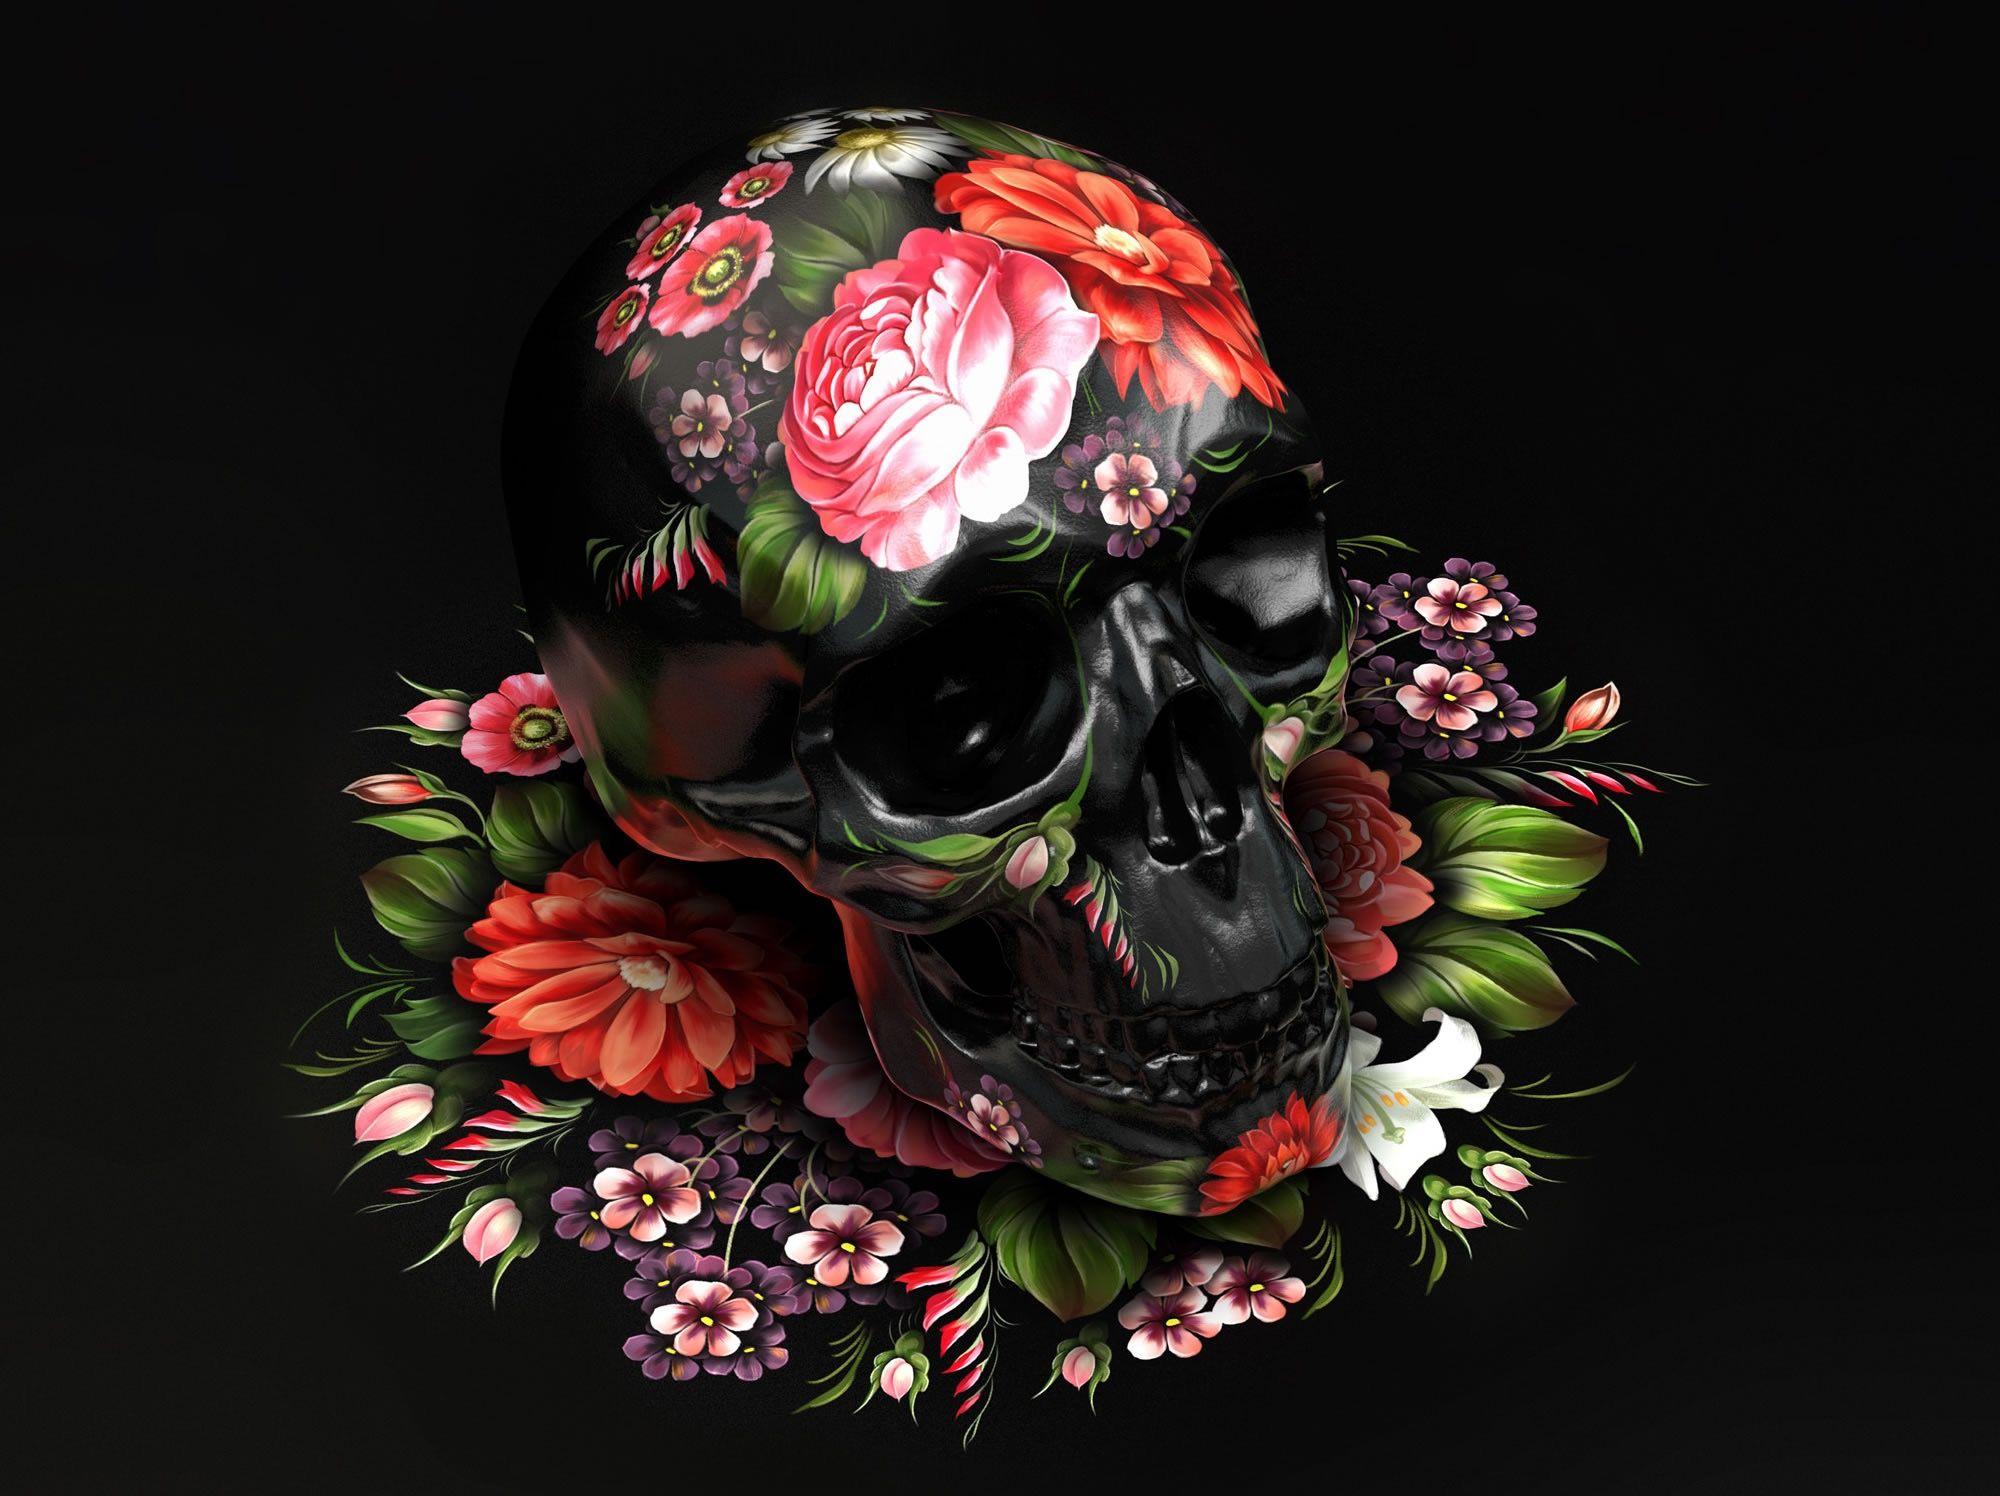 можно картинки с черепами с цветами же